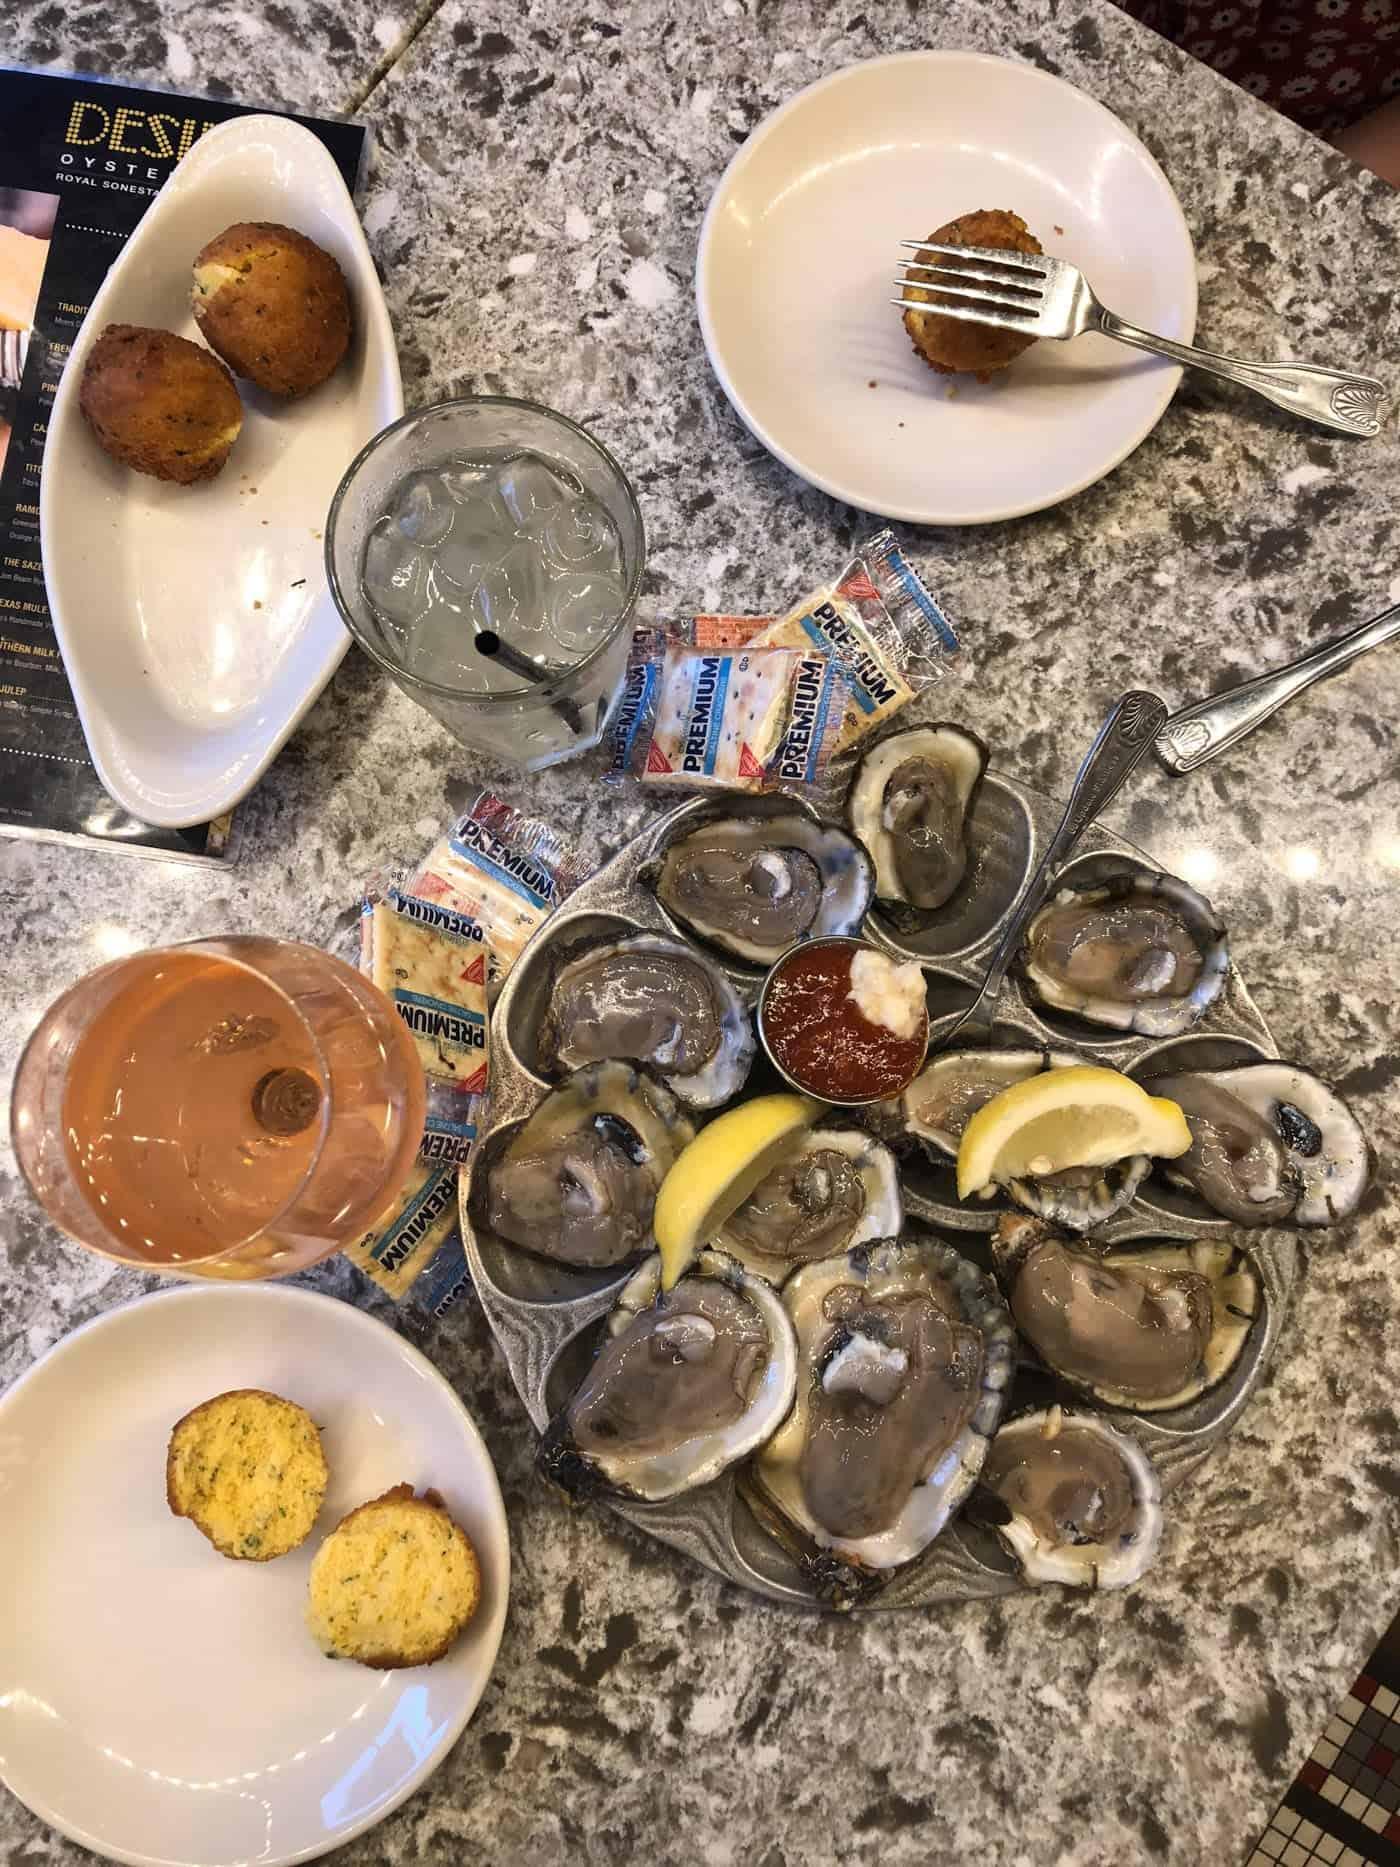 Royal Sonesta New Orleans Hotel Desire Oyster Bar